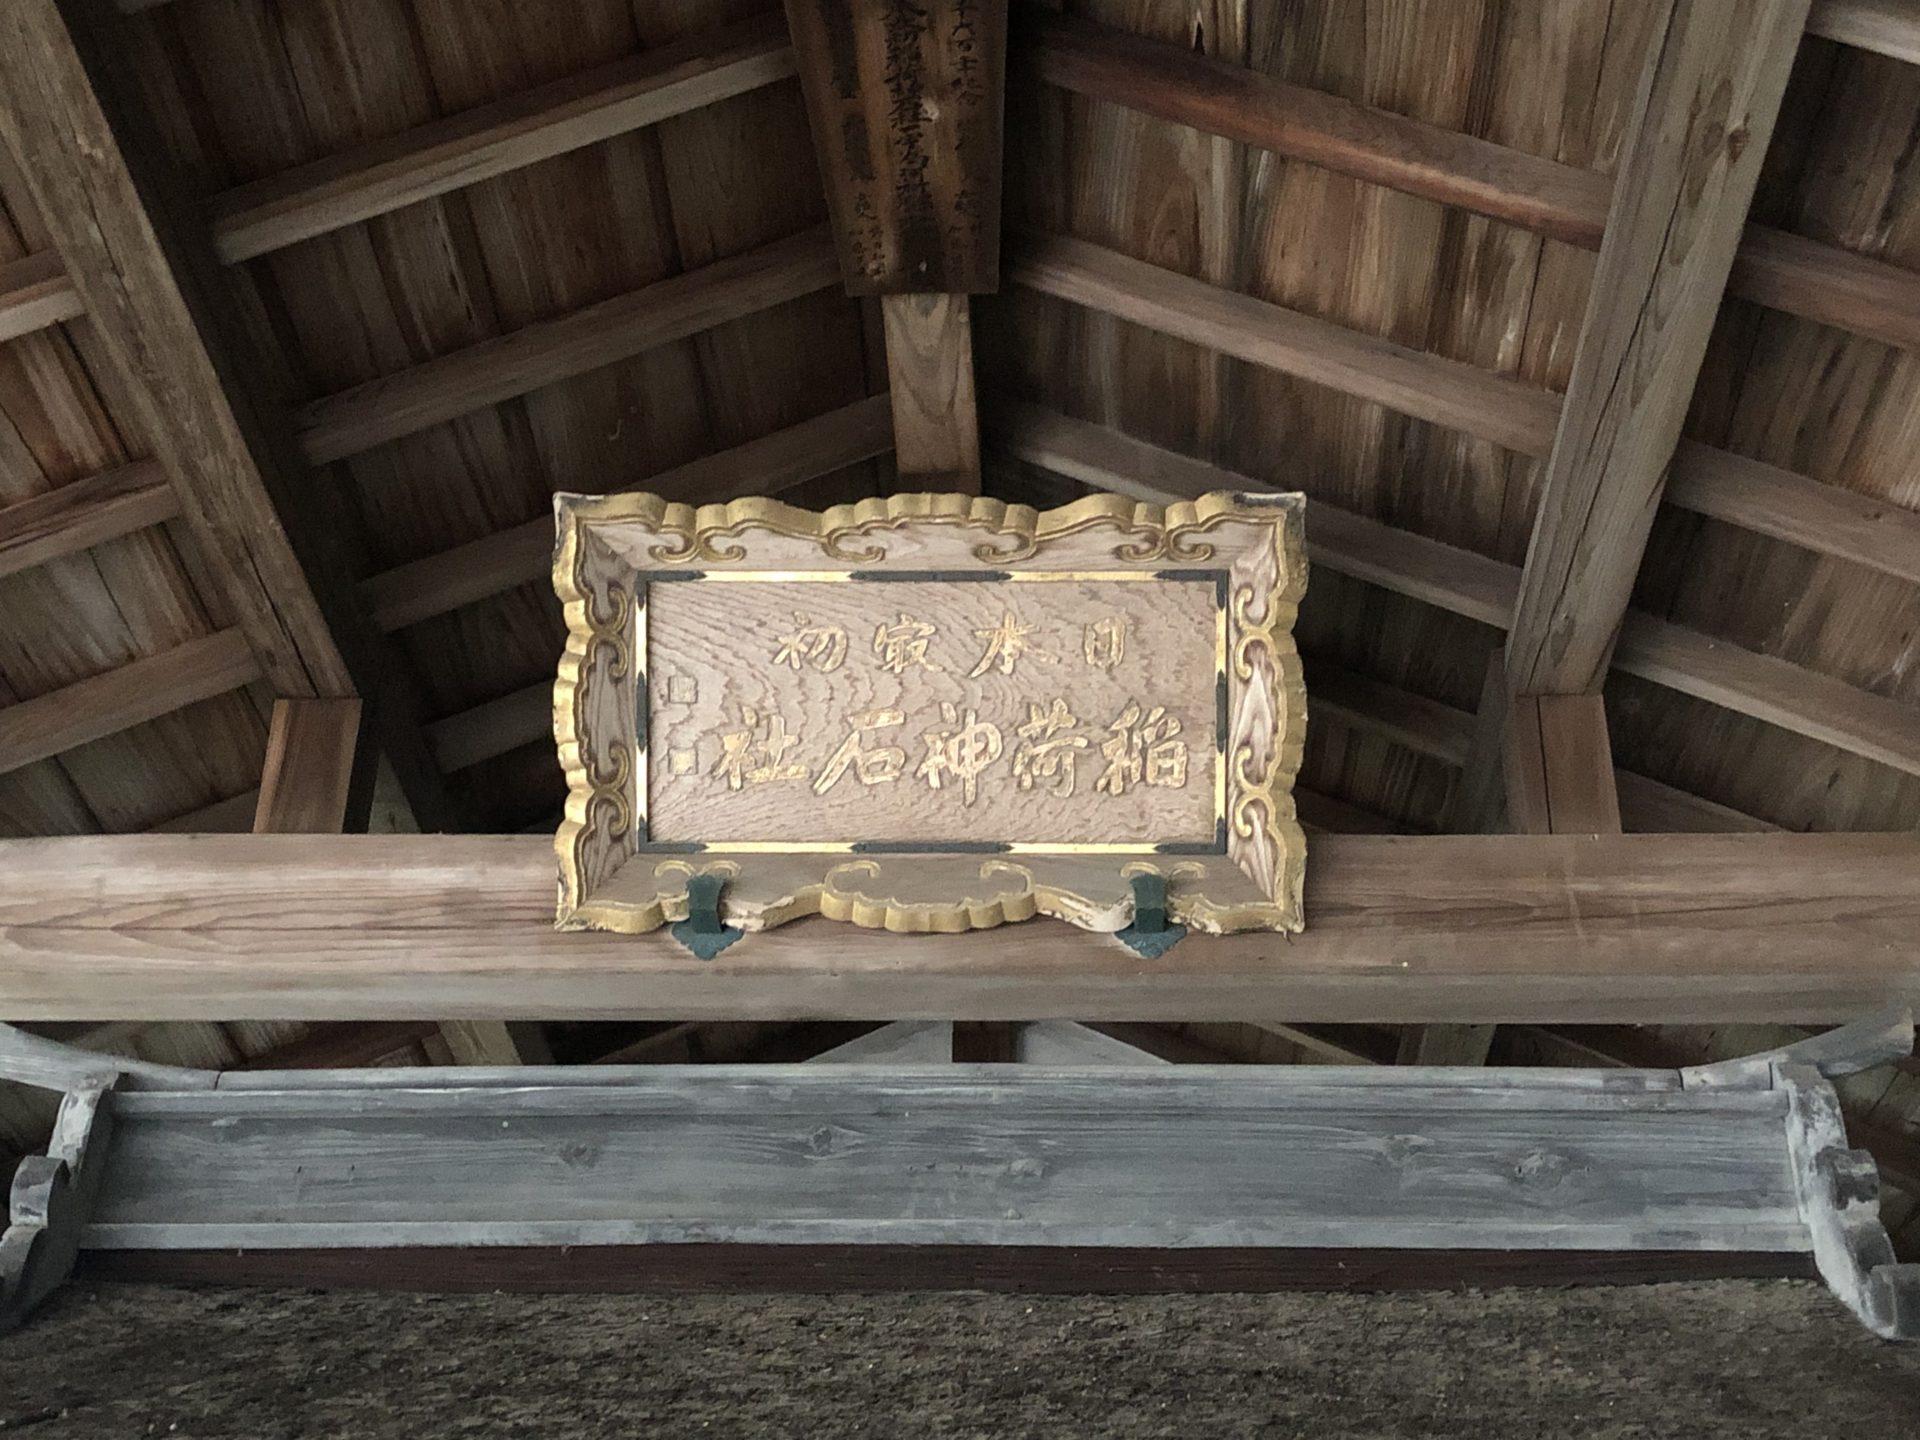 日本最初稲荷神石社の額